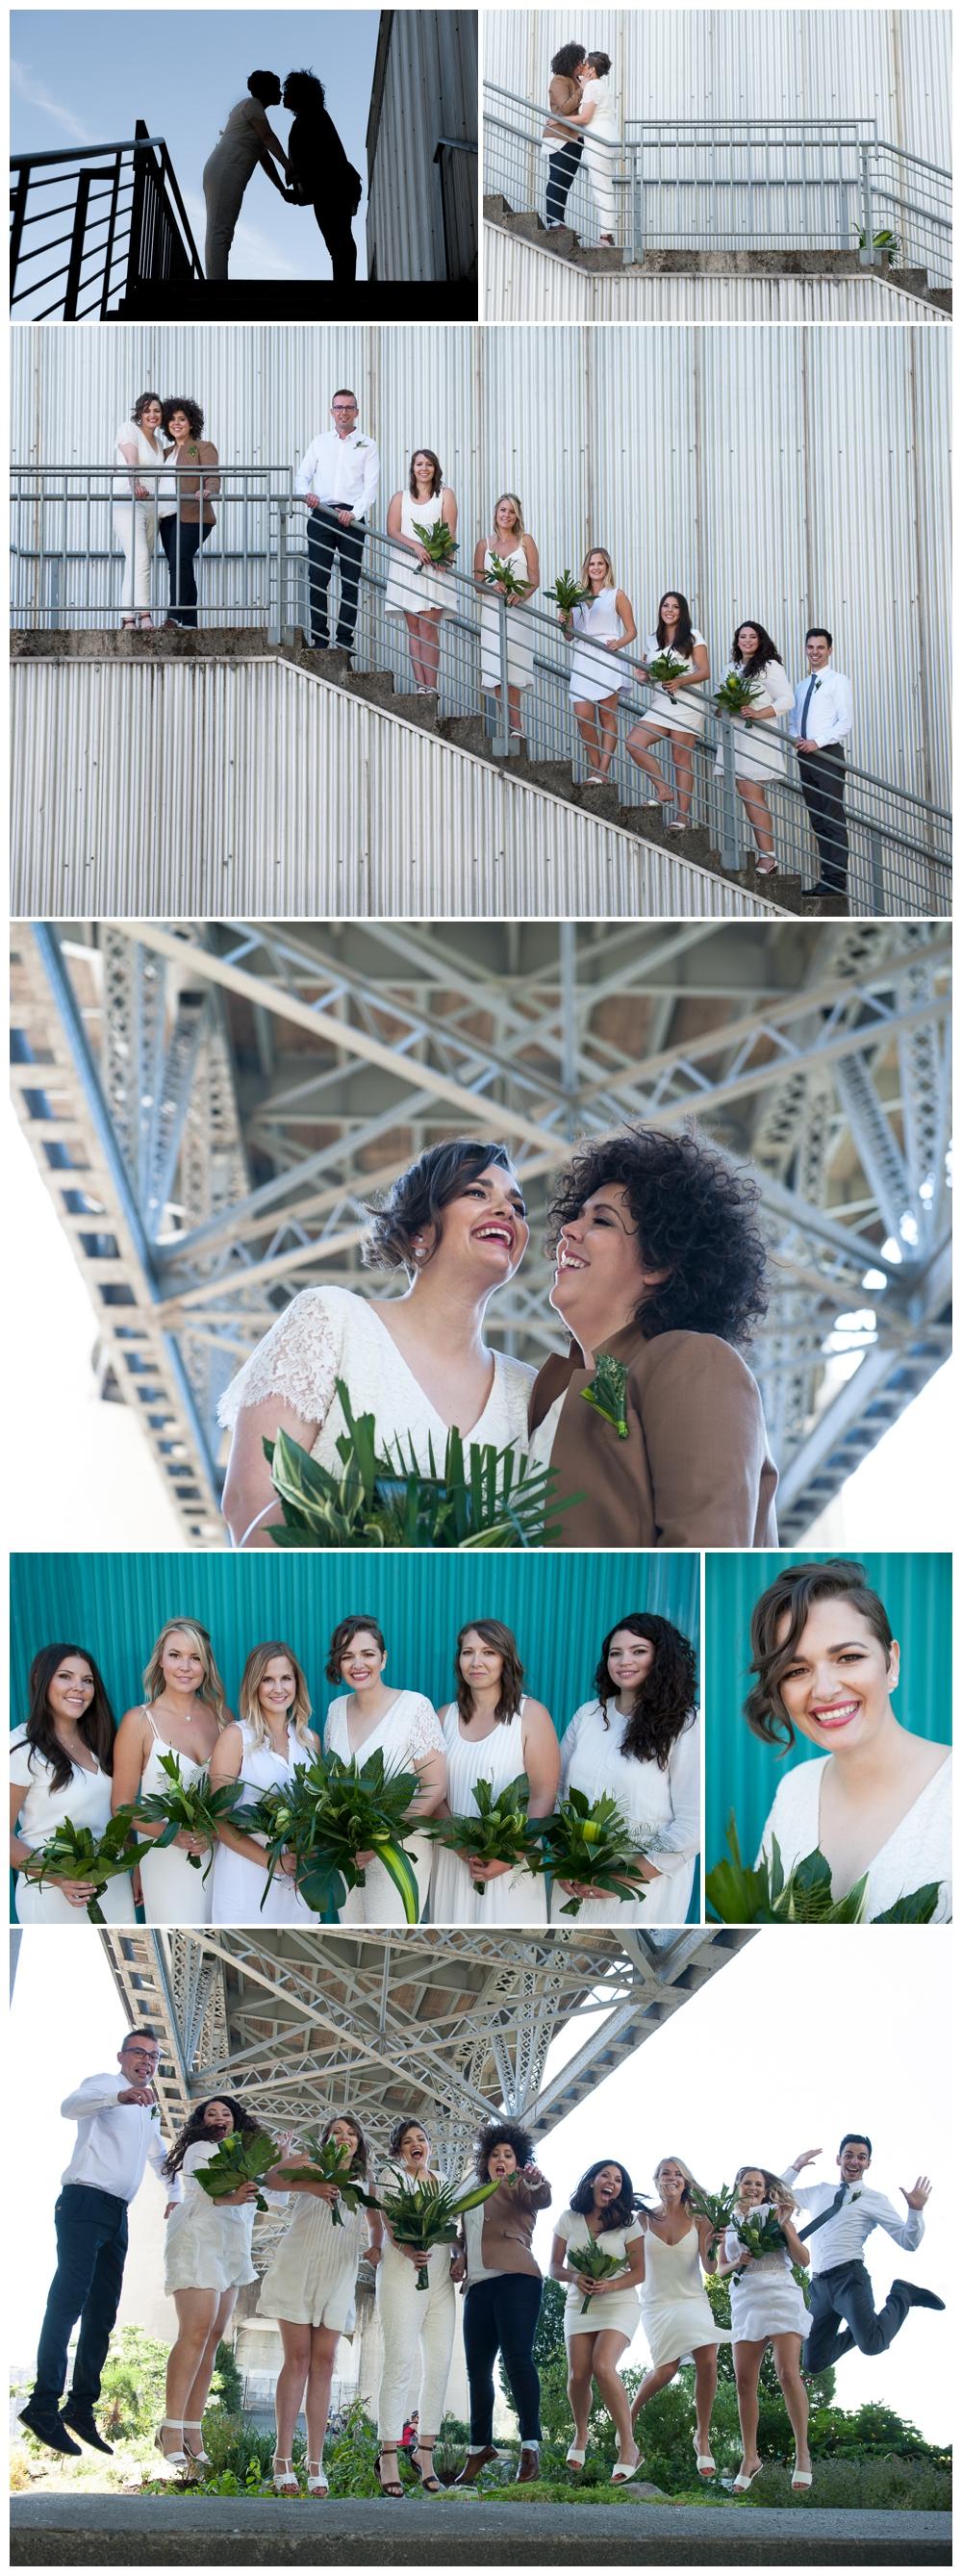 vancouver-lesbian-wedding-belle-ancell_04.jpg